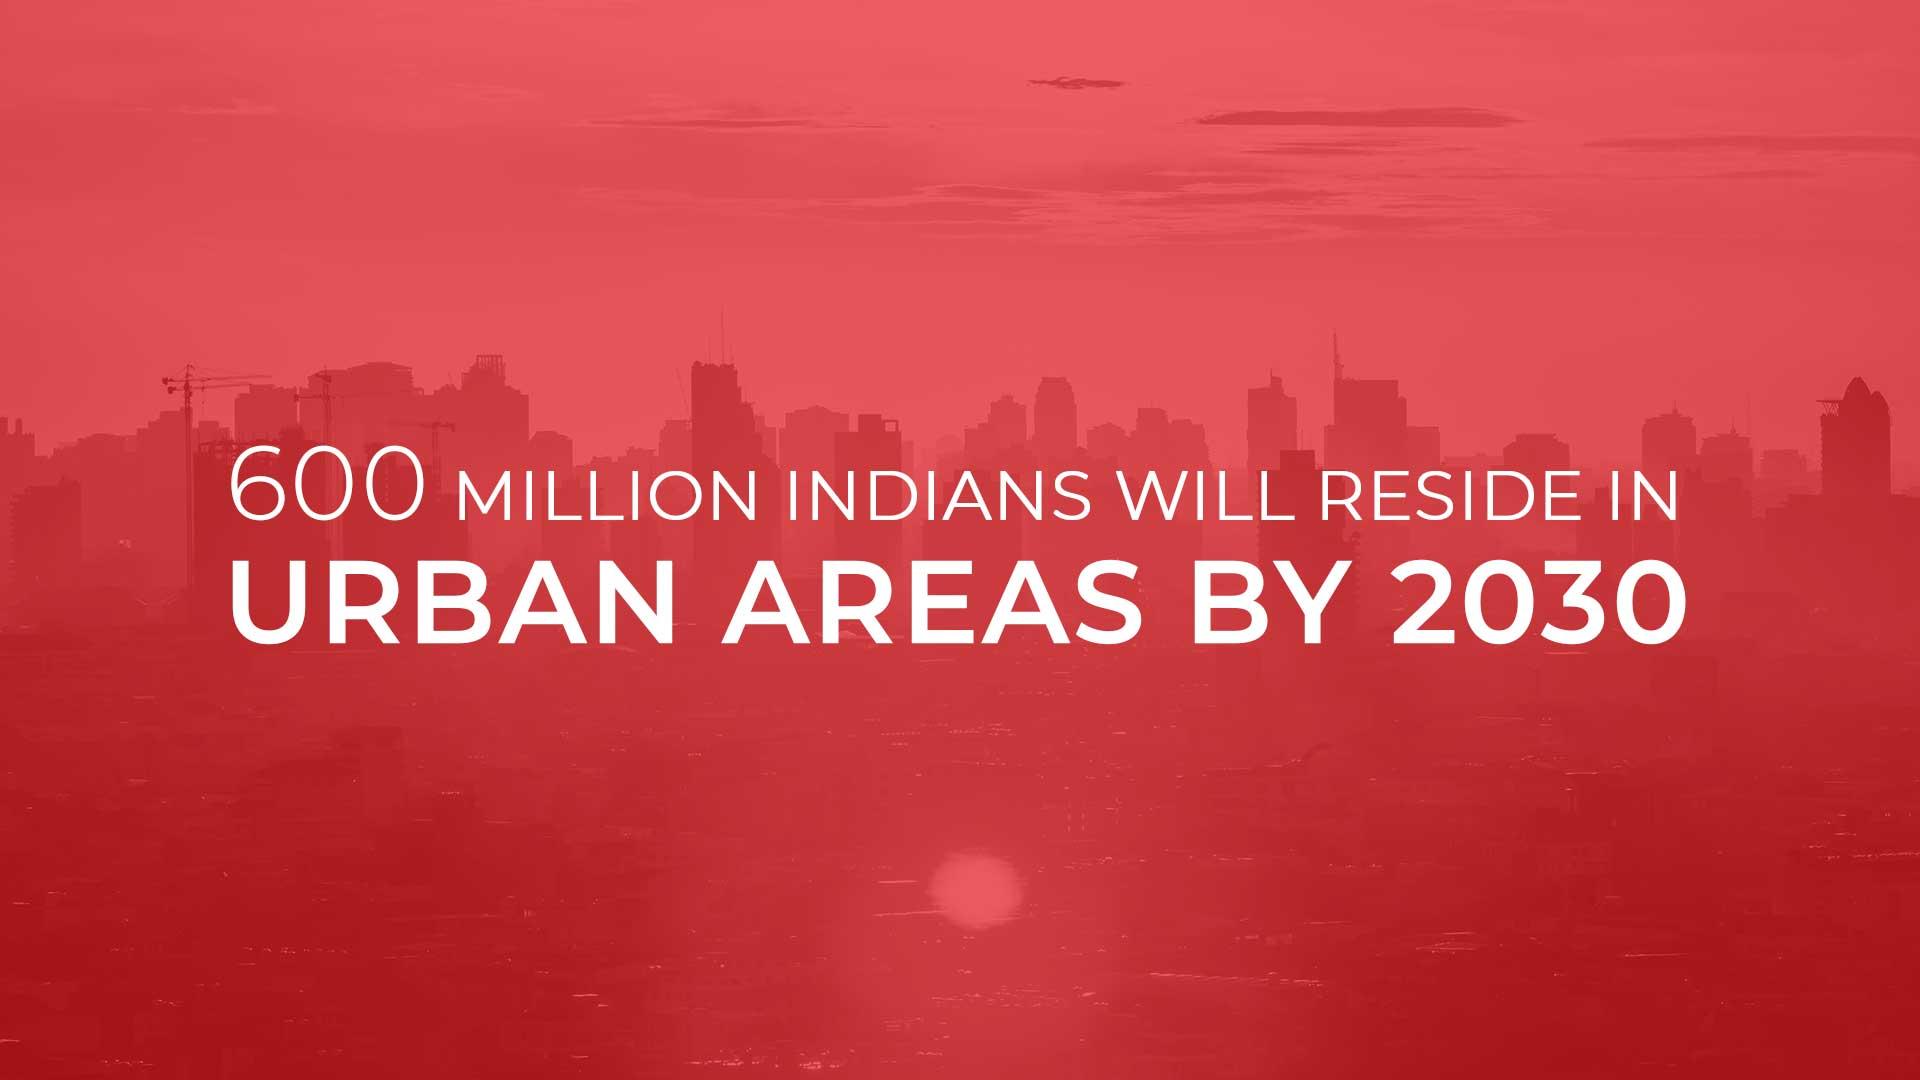 To Meet Urban Demands, India To Build 700-900 Million Sq.Mts. Till 2030